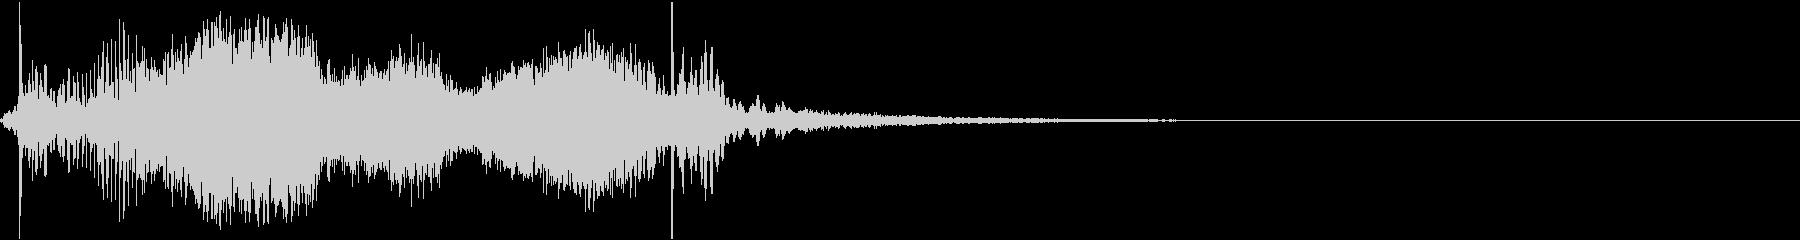 SciFi EC03_96_2の未再生の波形